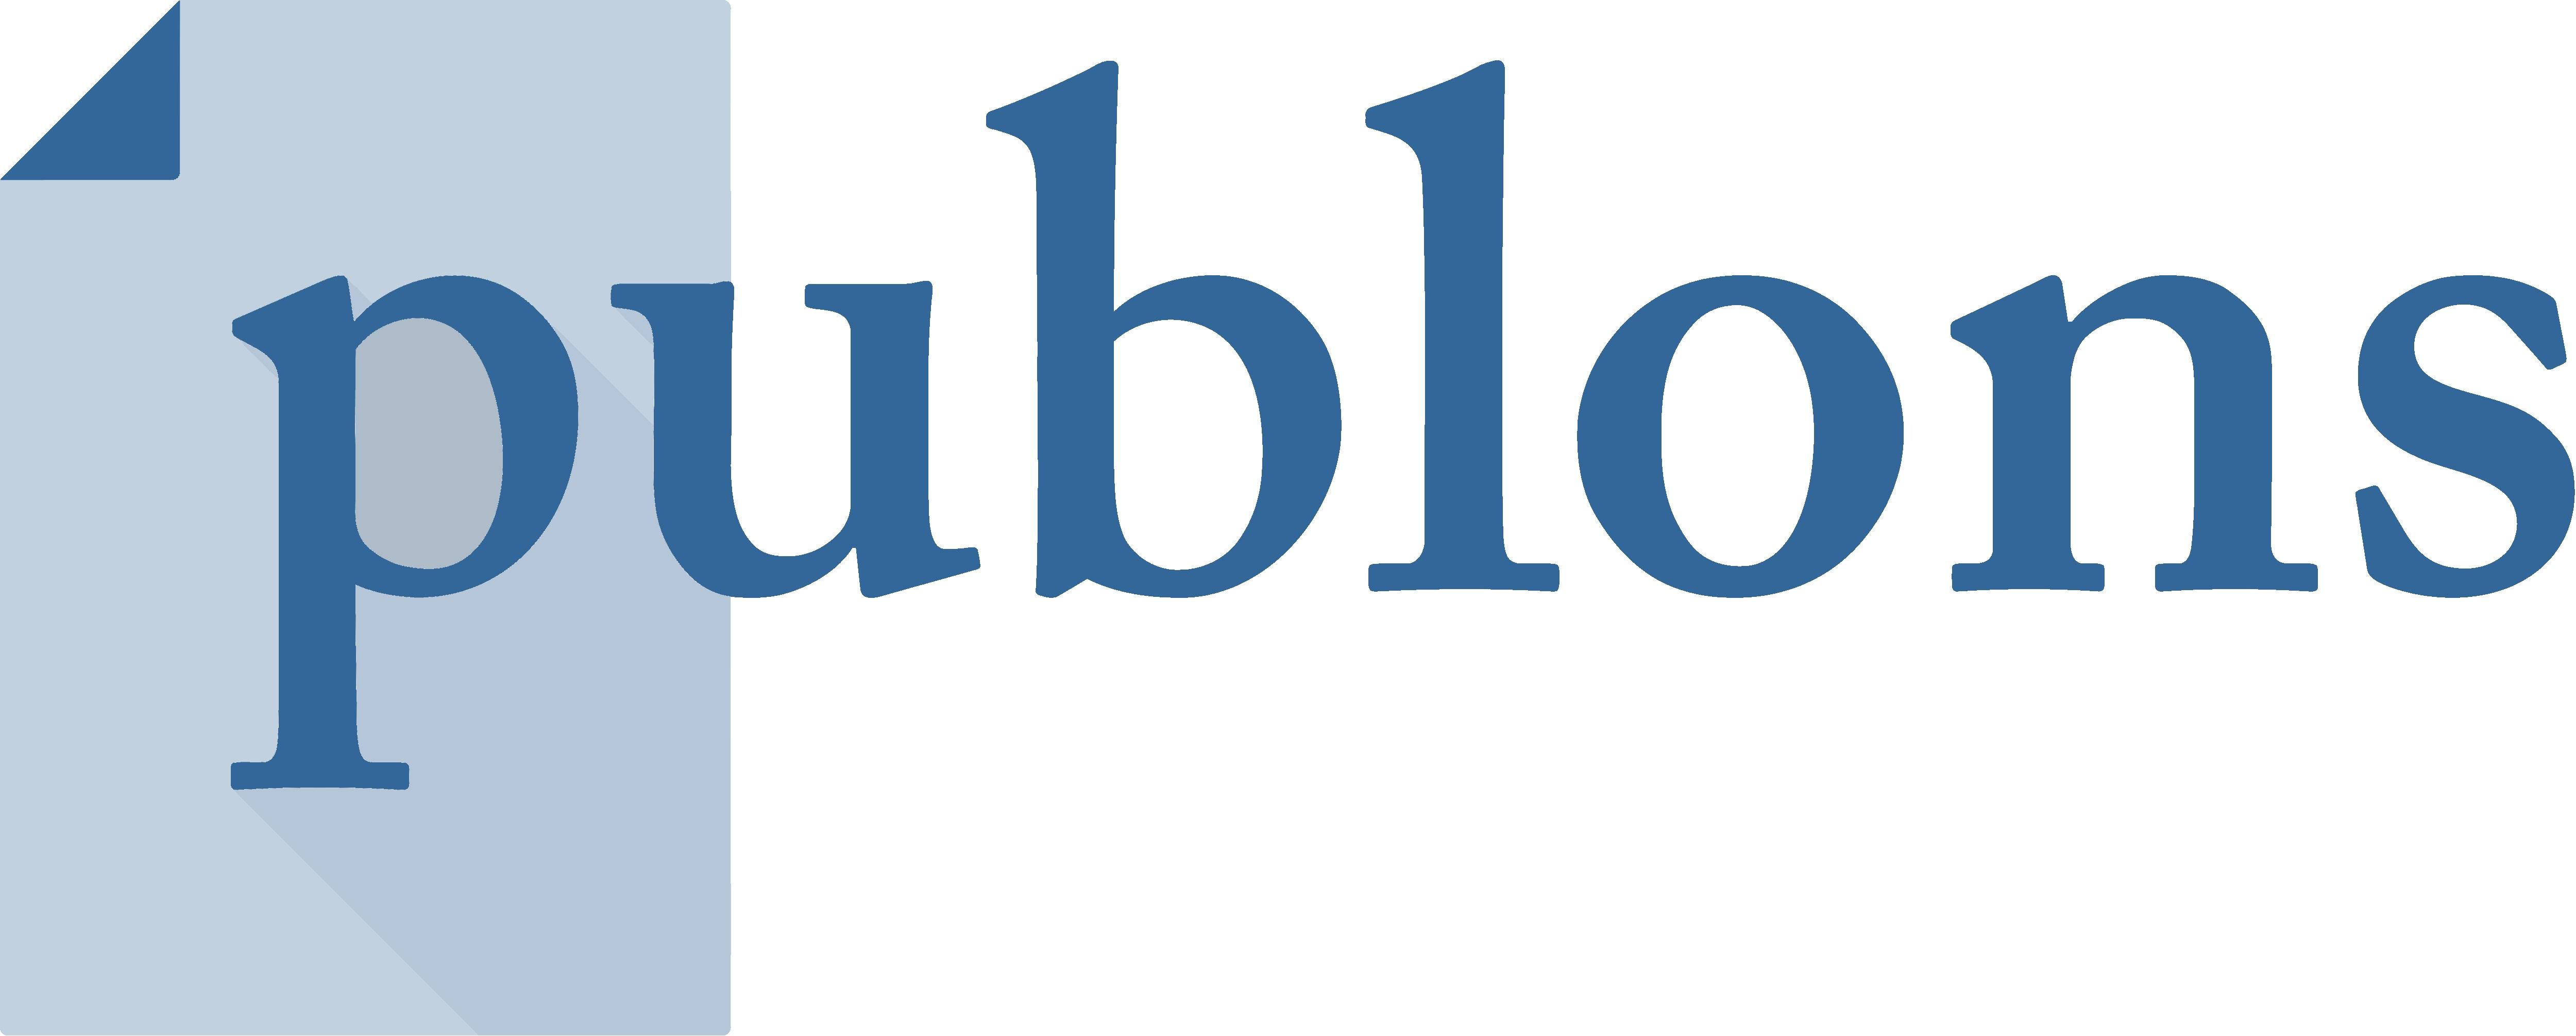 publons-logo | Geological Society of London blog